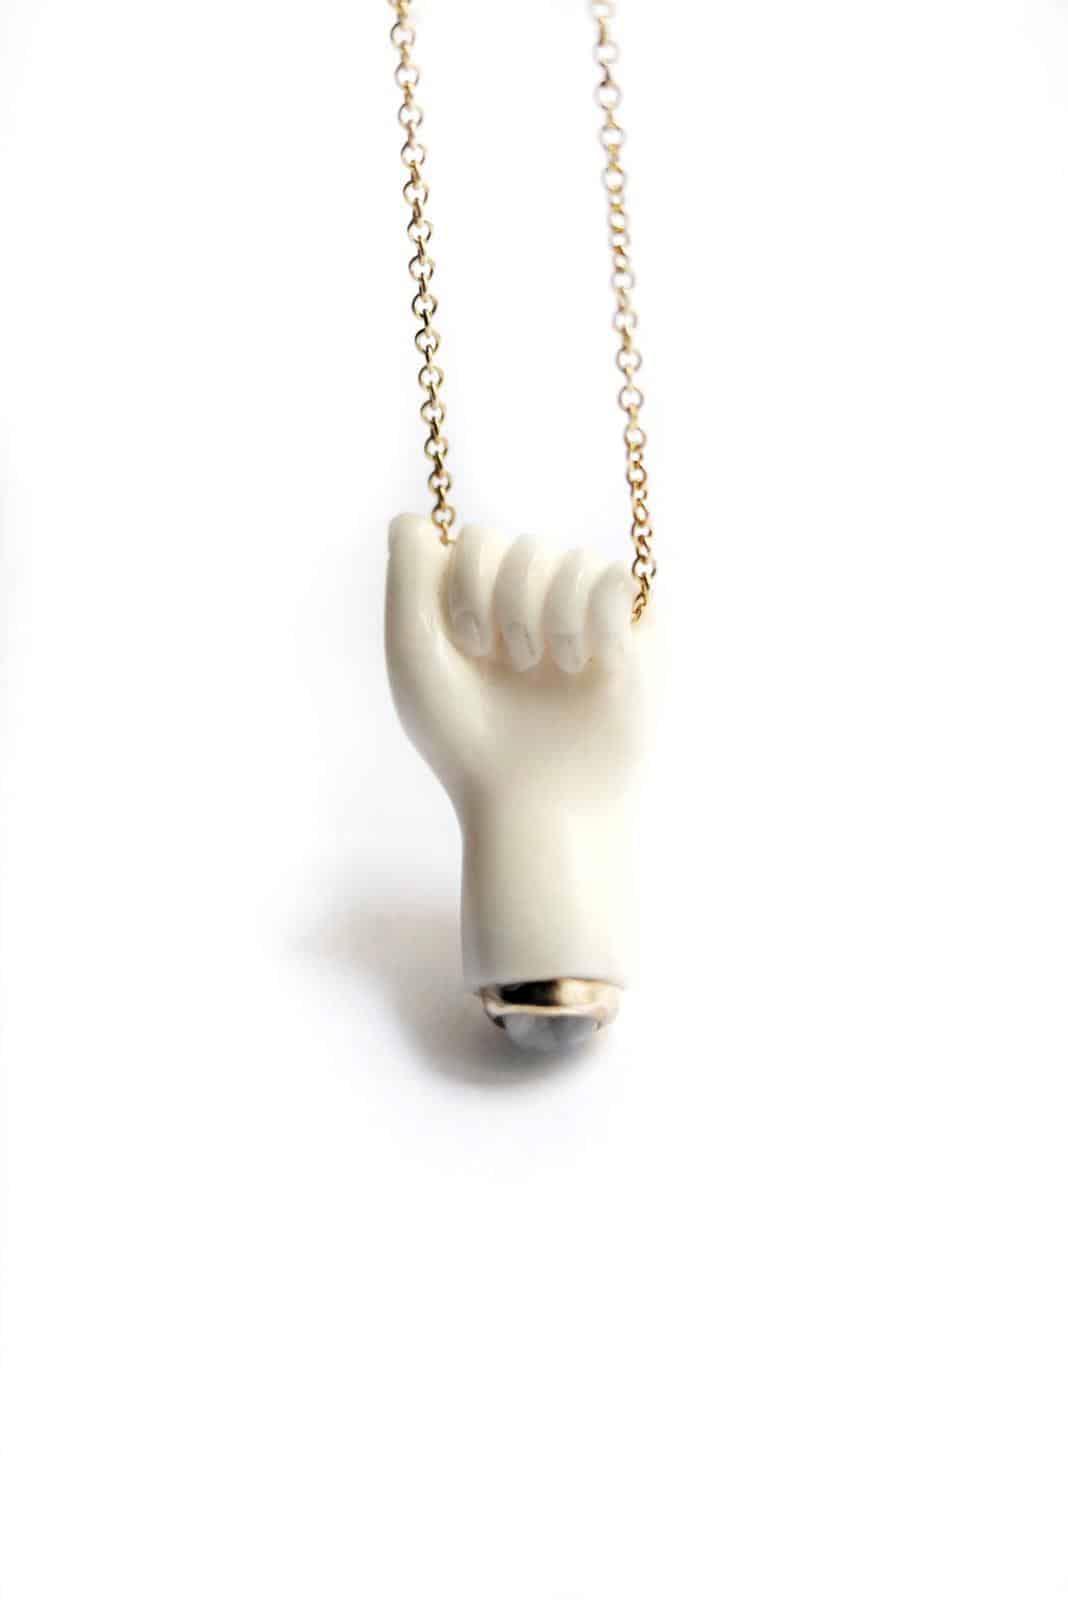 MOODra hand by Kari Mineralosophie